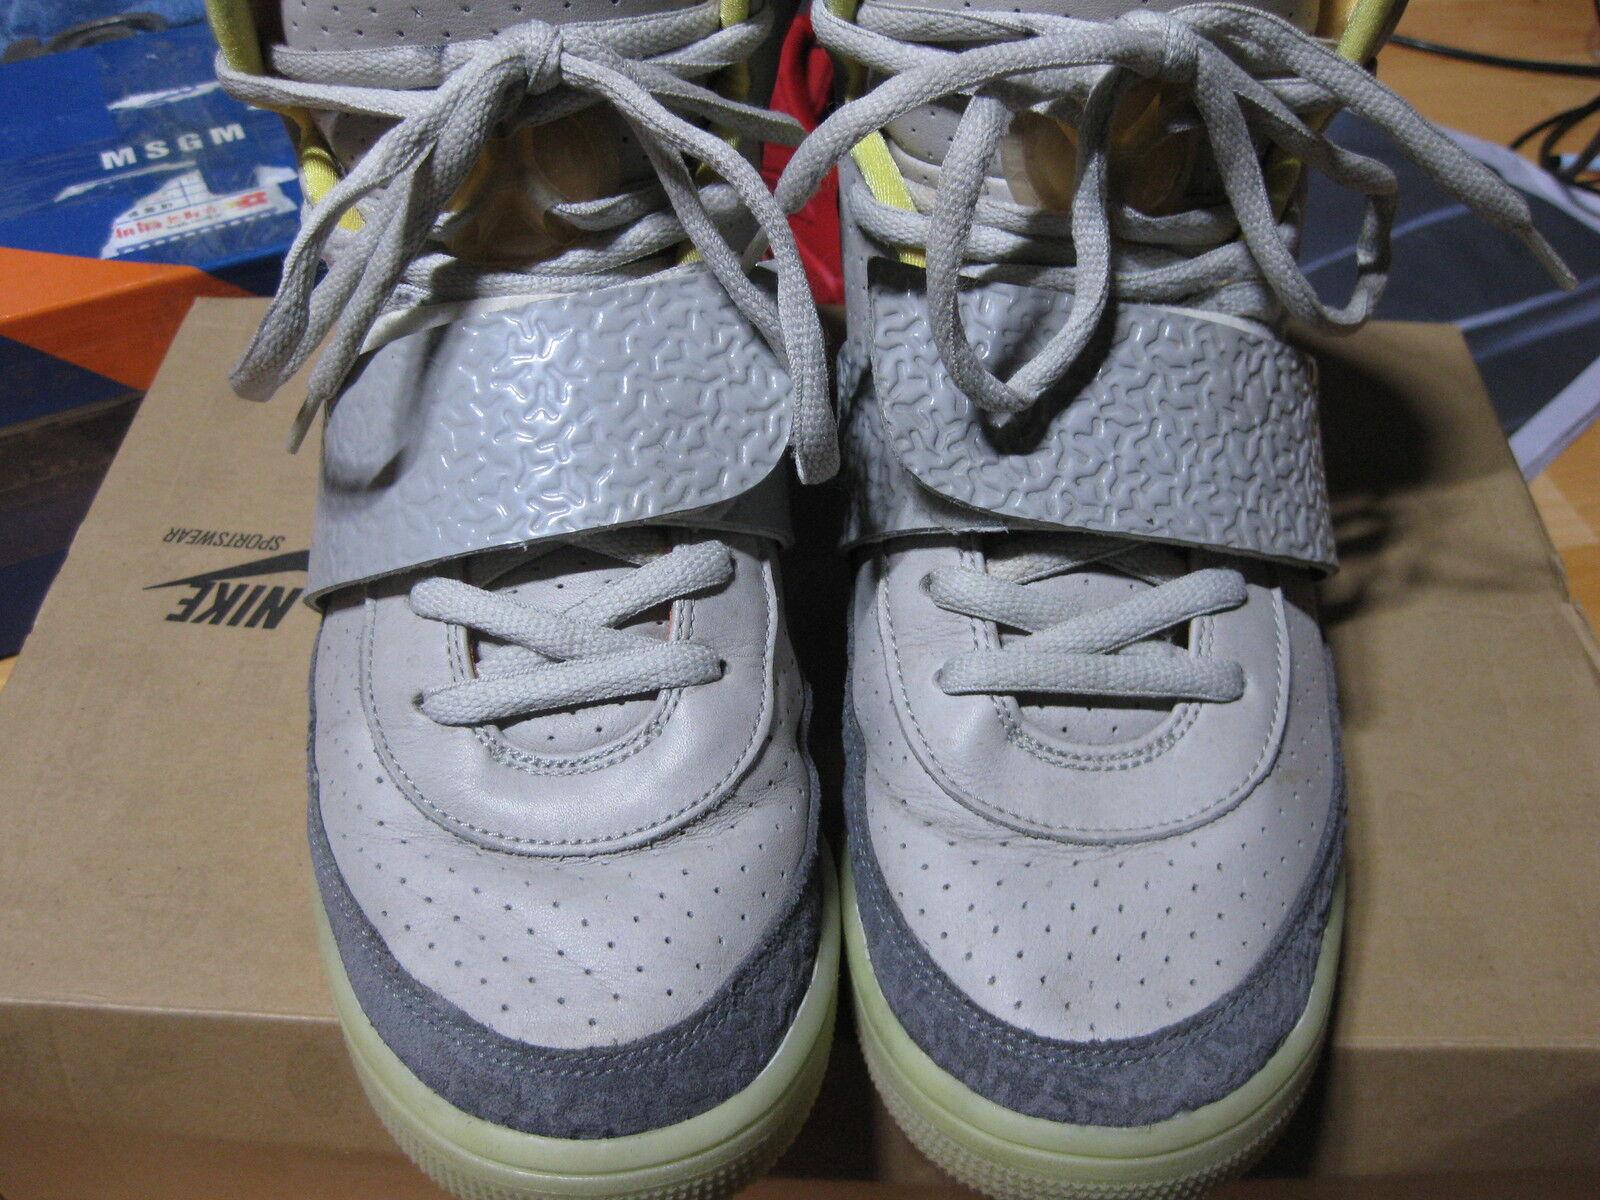 Nike Air Yeezy 9 1 Zen Gray Sz 9 Yeezy 2449a5